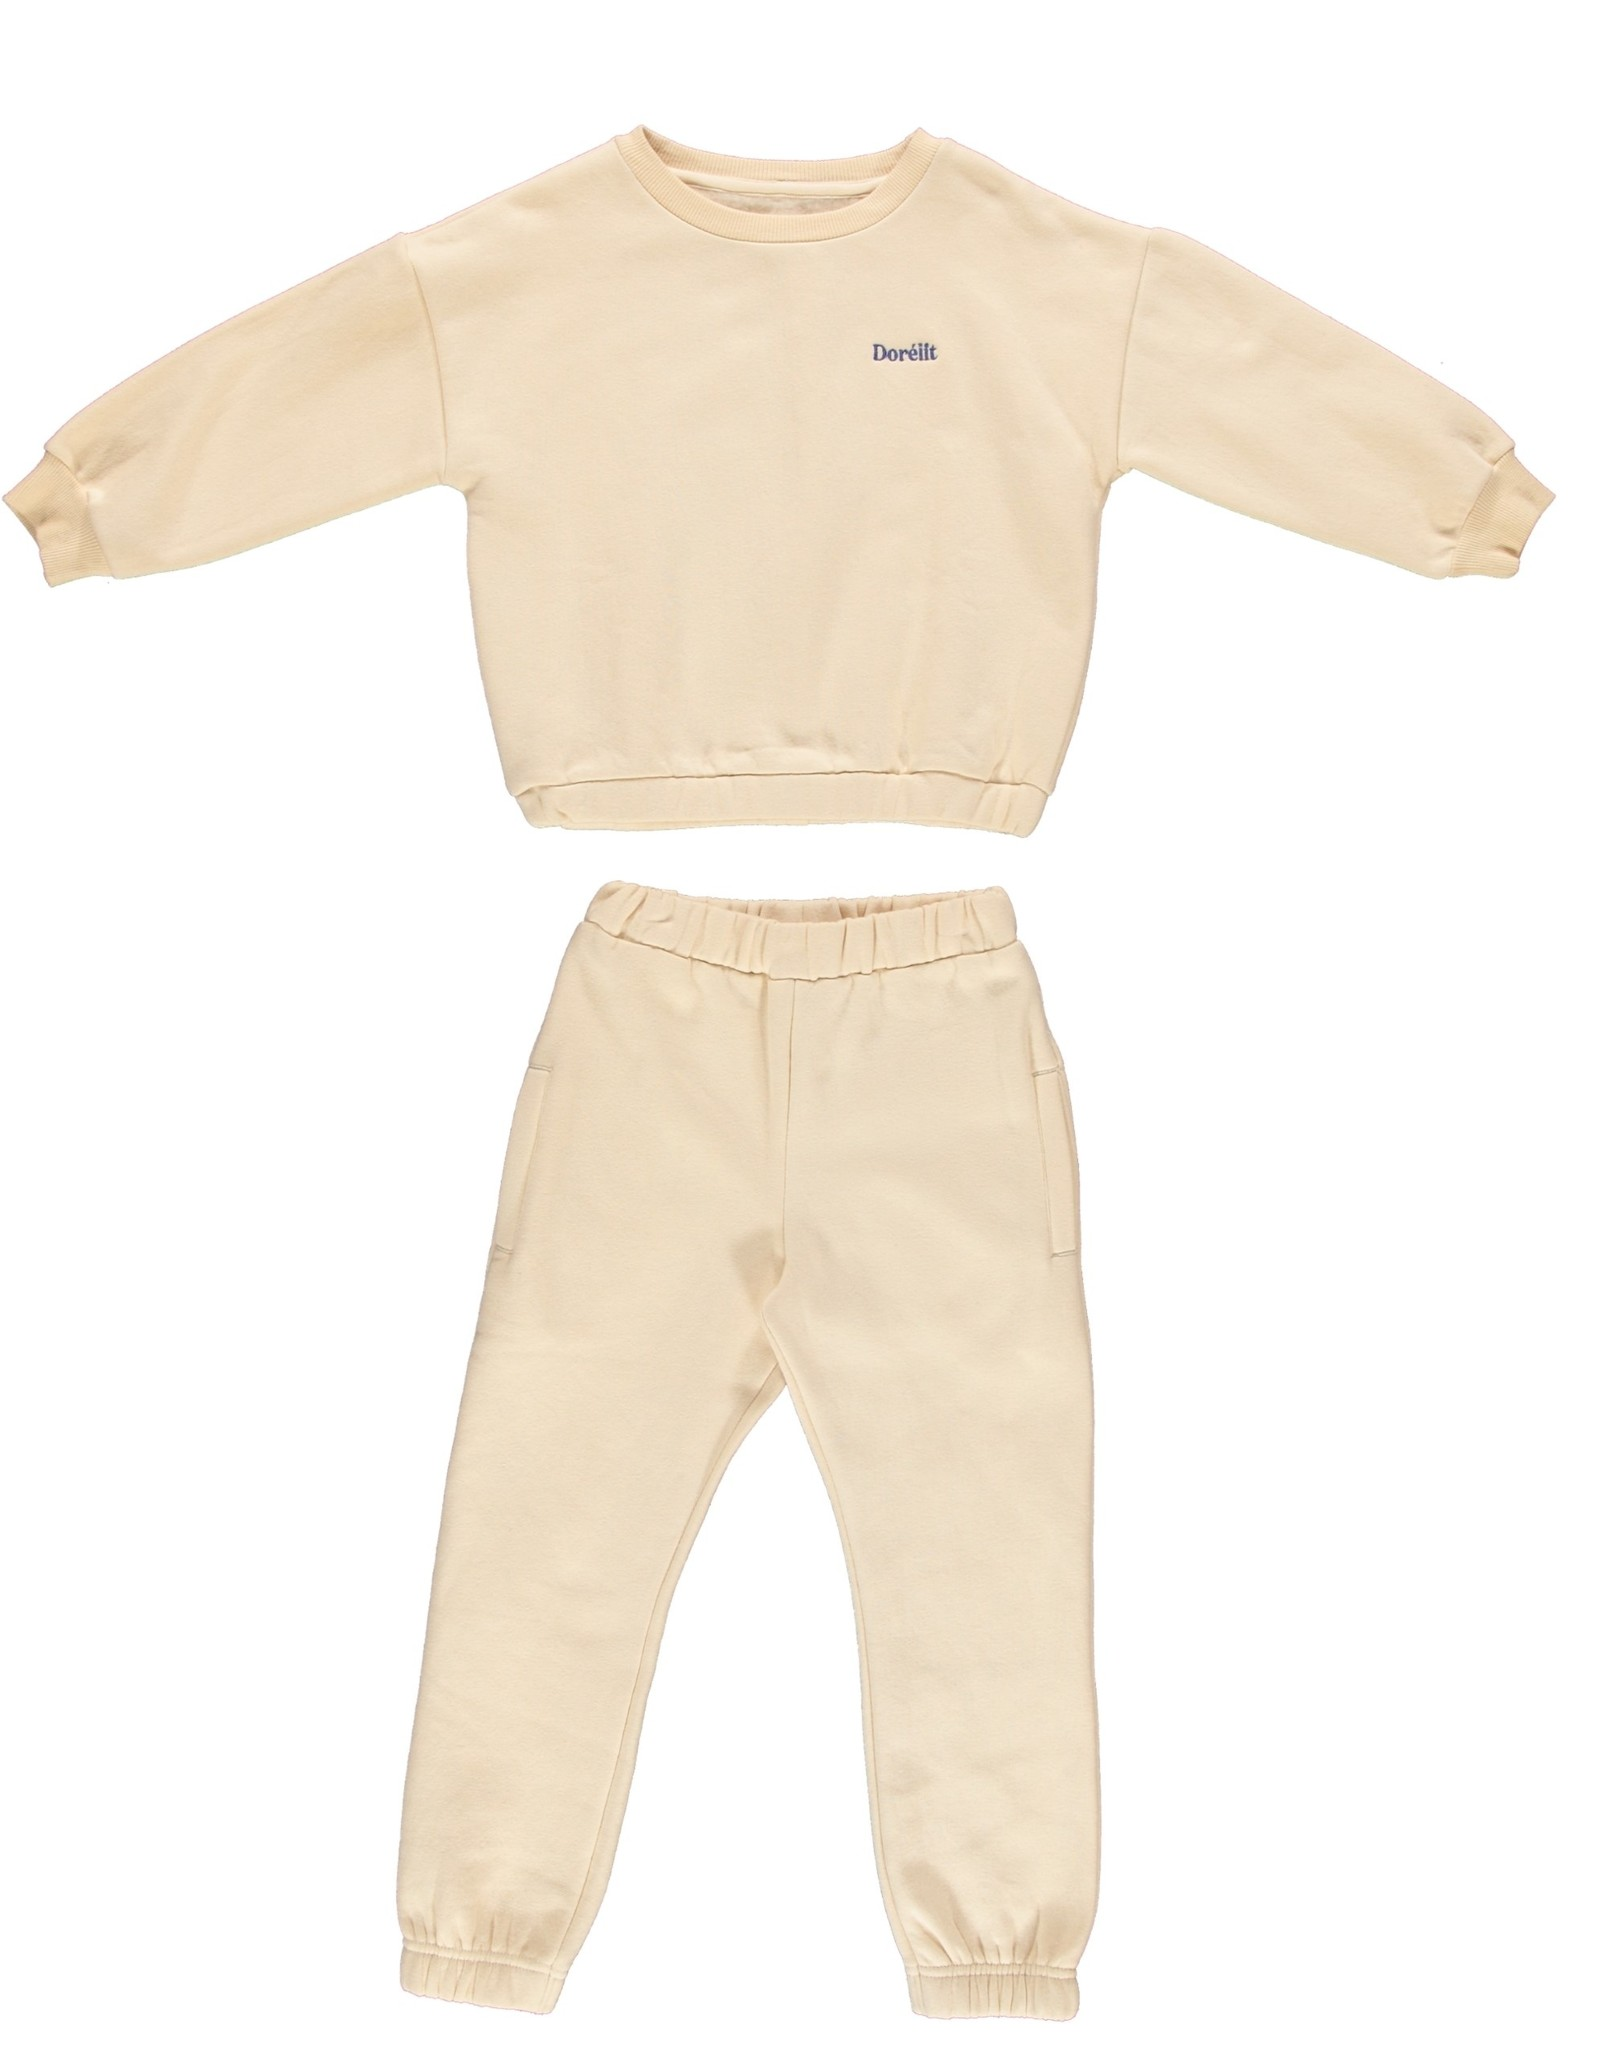 Dorélit Freya + Felix   Pajama Set Fleece   Offwhite